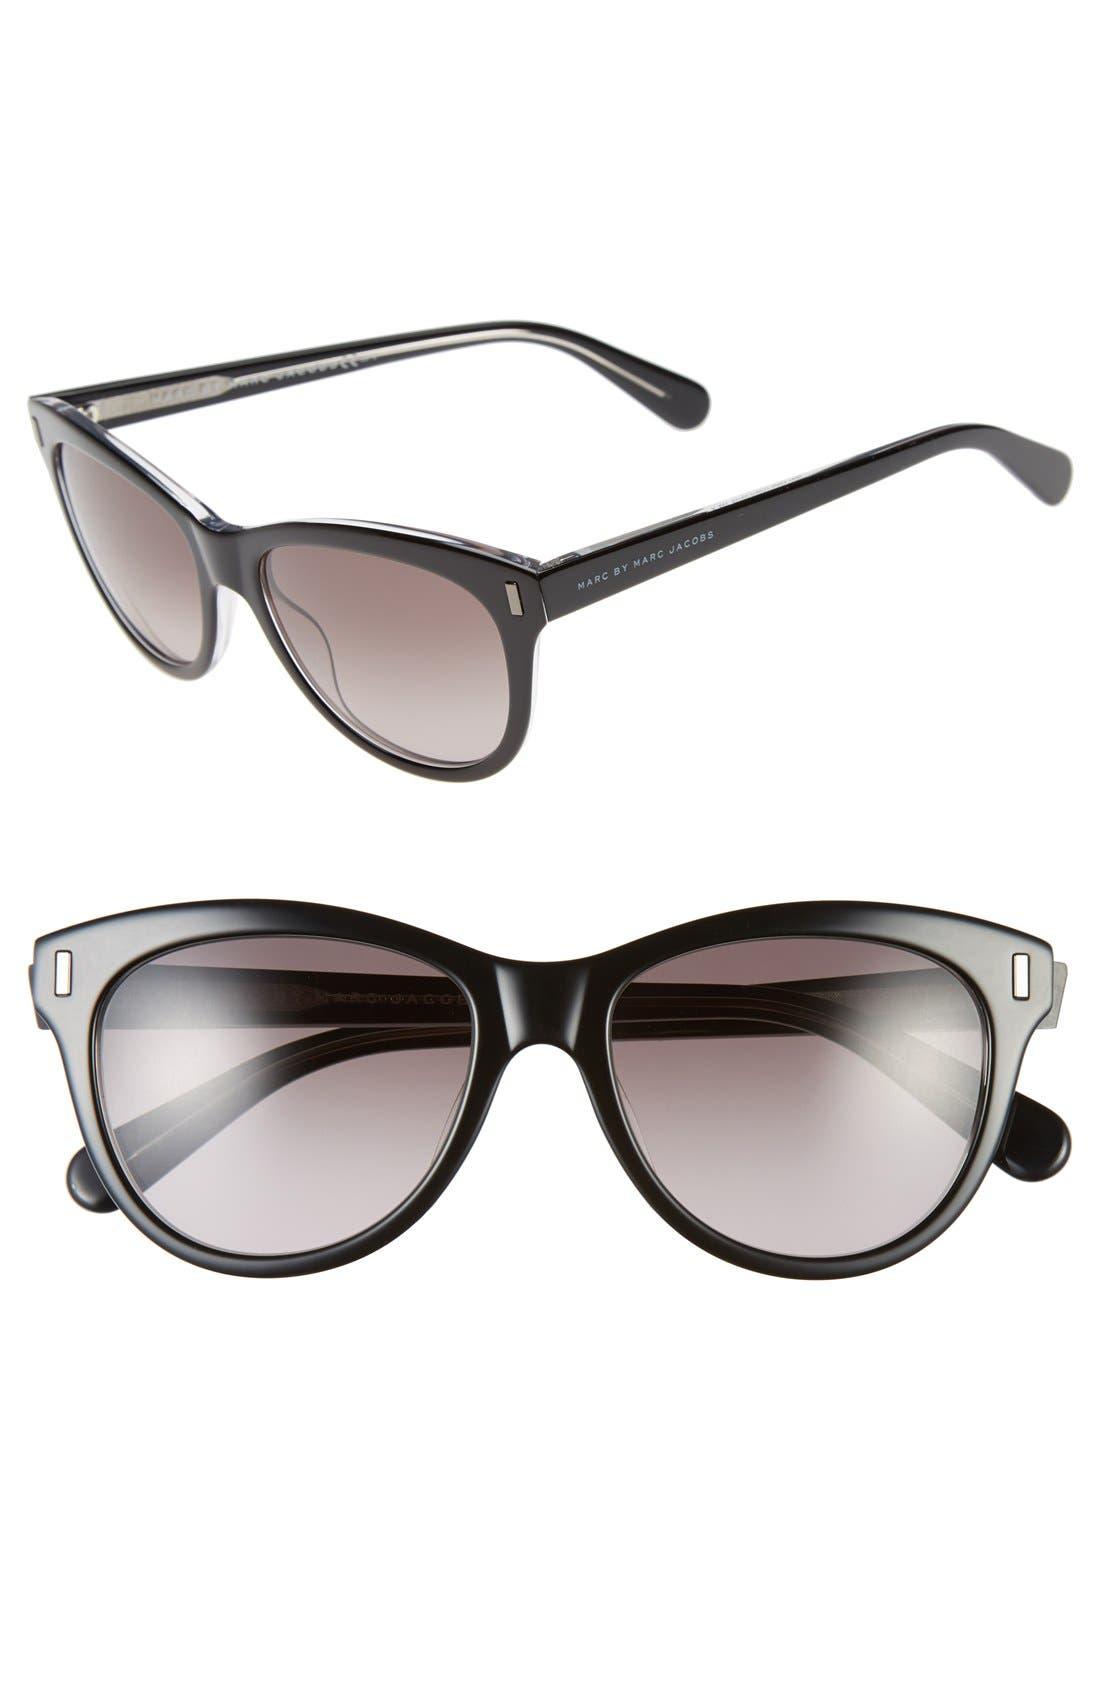 53mm Retro Sunglasses,                             Main thumbnail 1, color,                             001